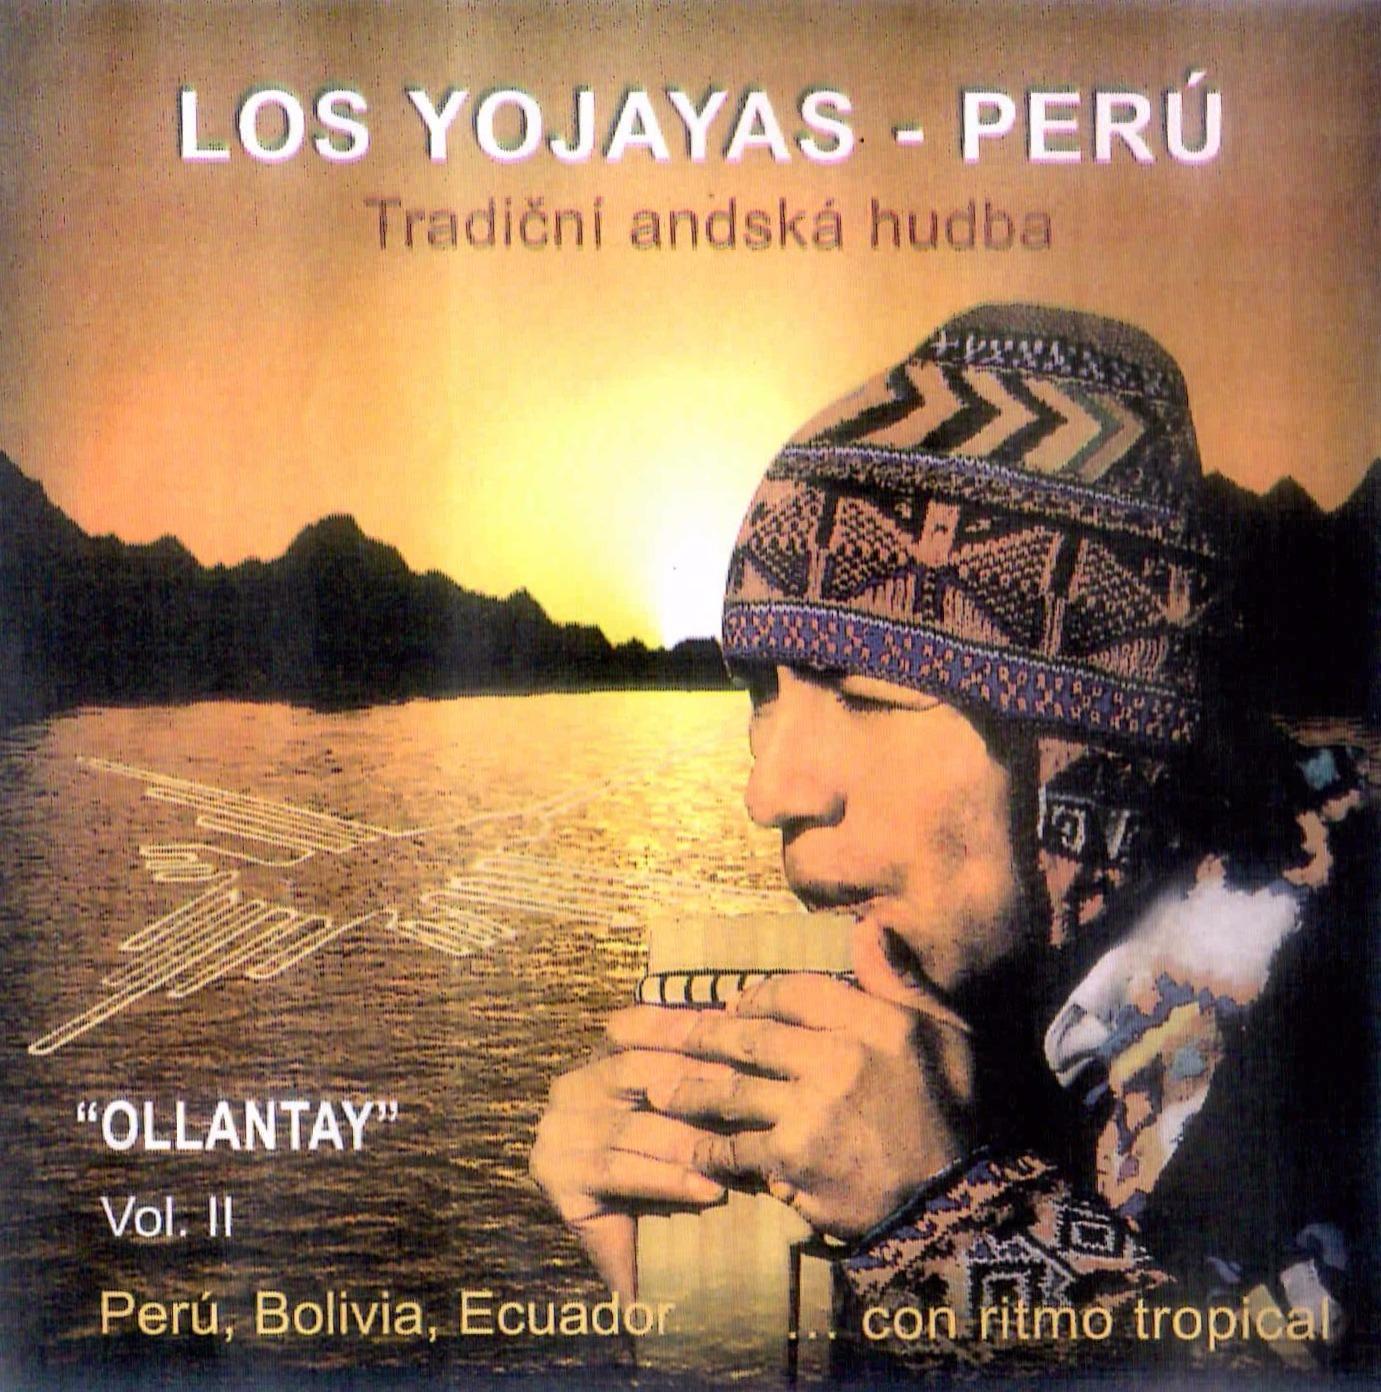 Download Song Taki Taki Rumba: Solo Musica Andina: Los Yojayas